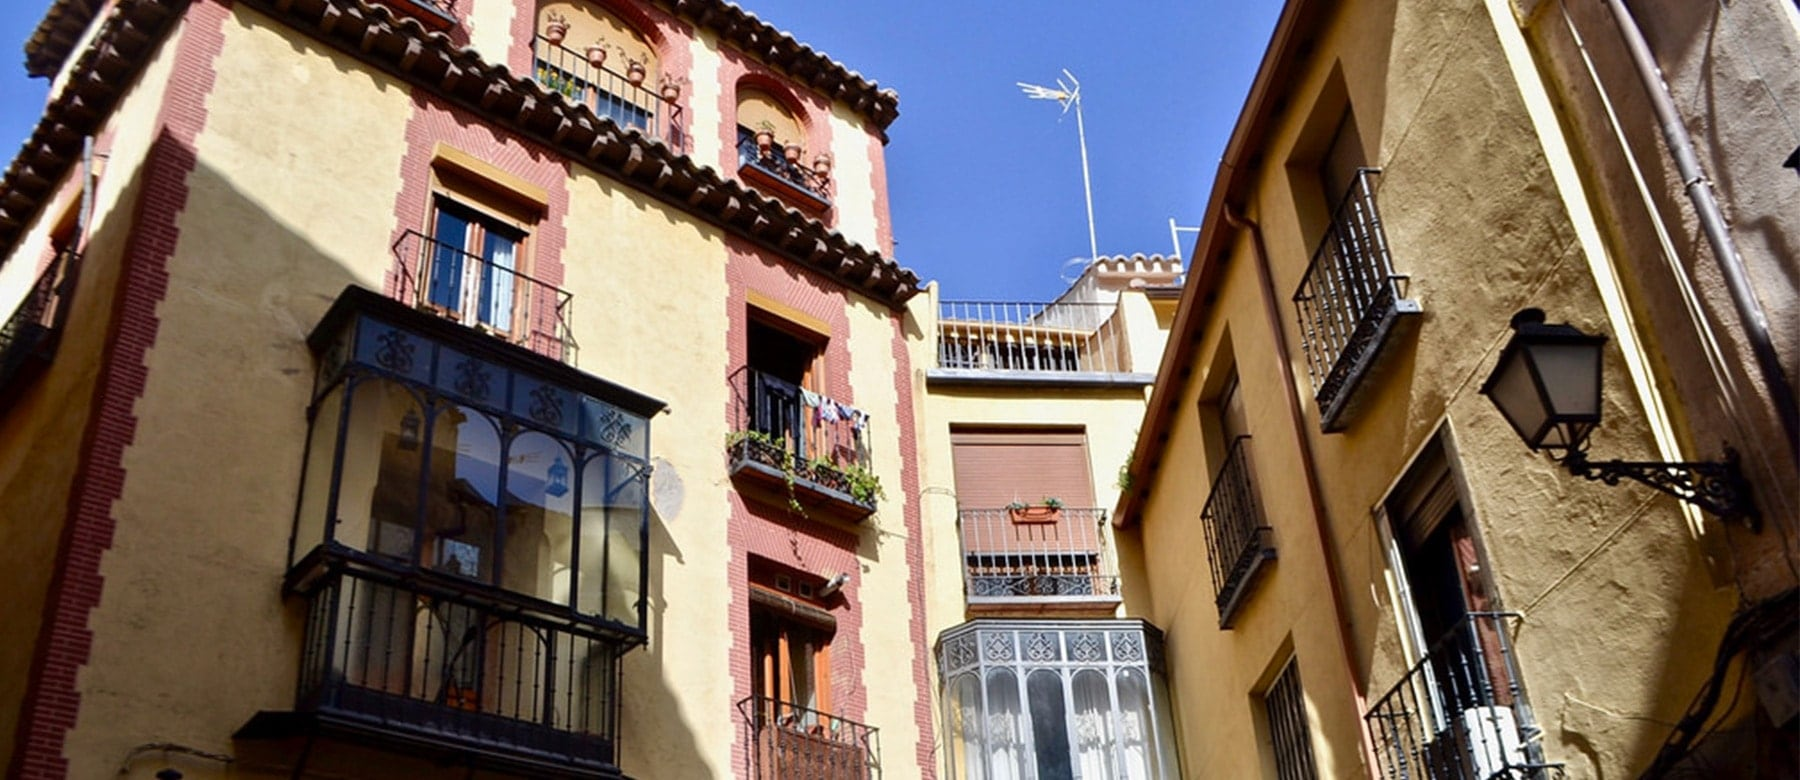 Walk the Mile in Spain